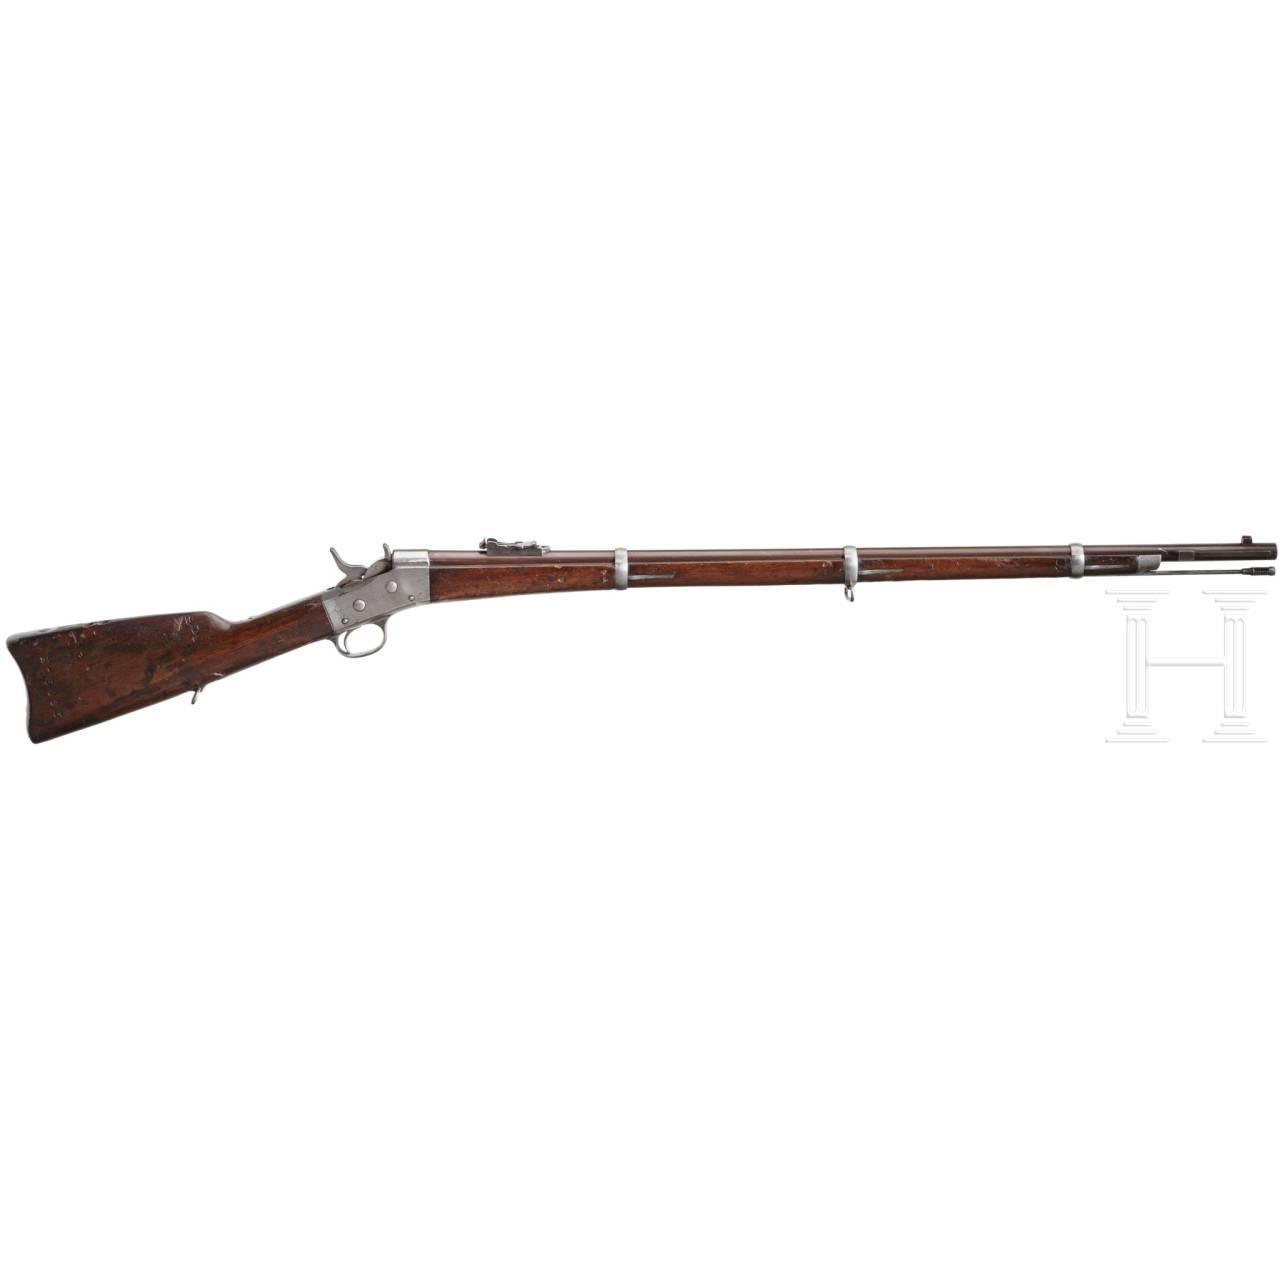 Remington Rolling Block M 1867